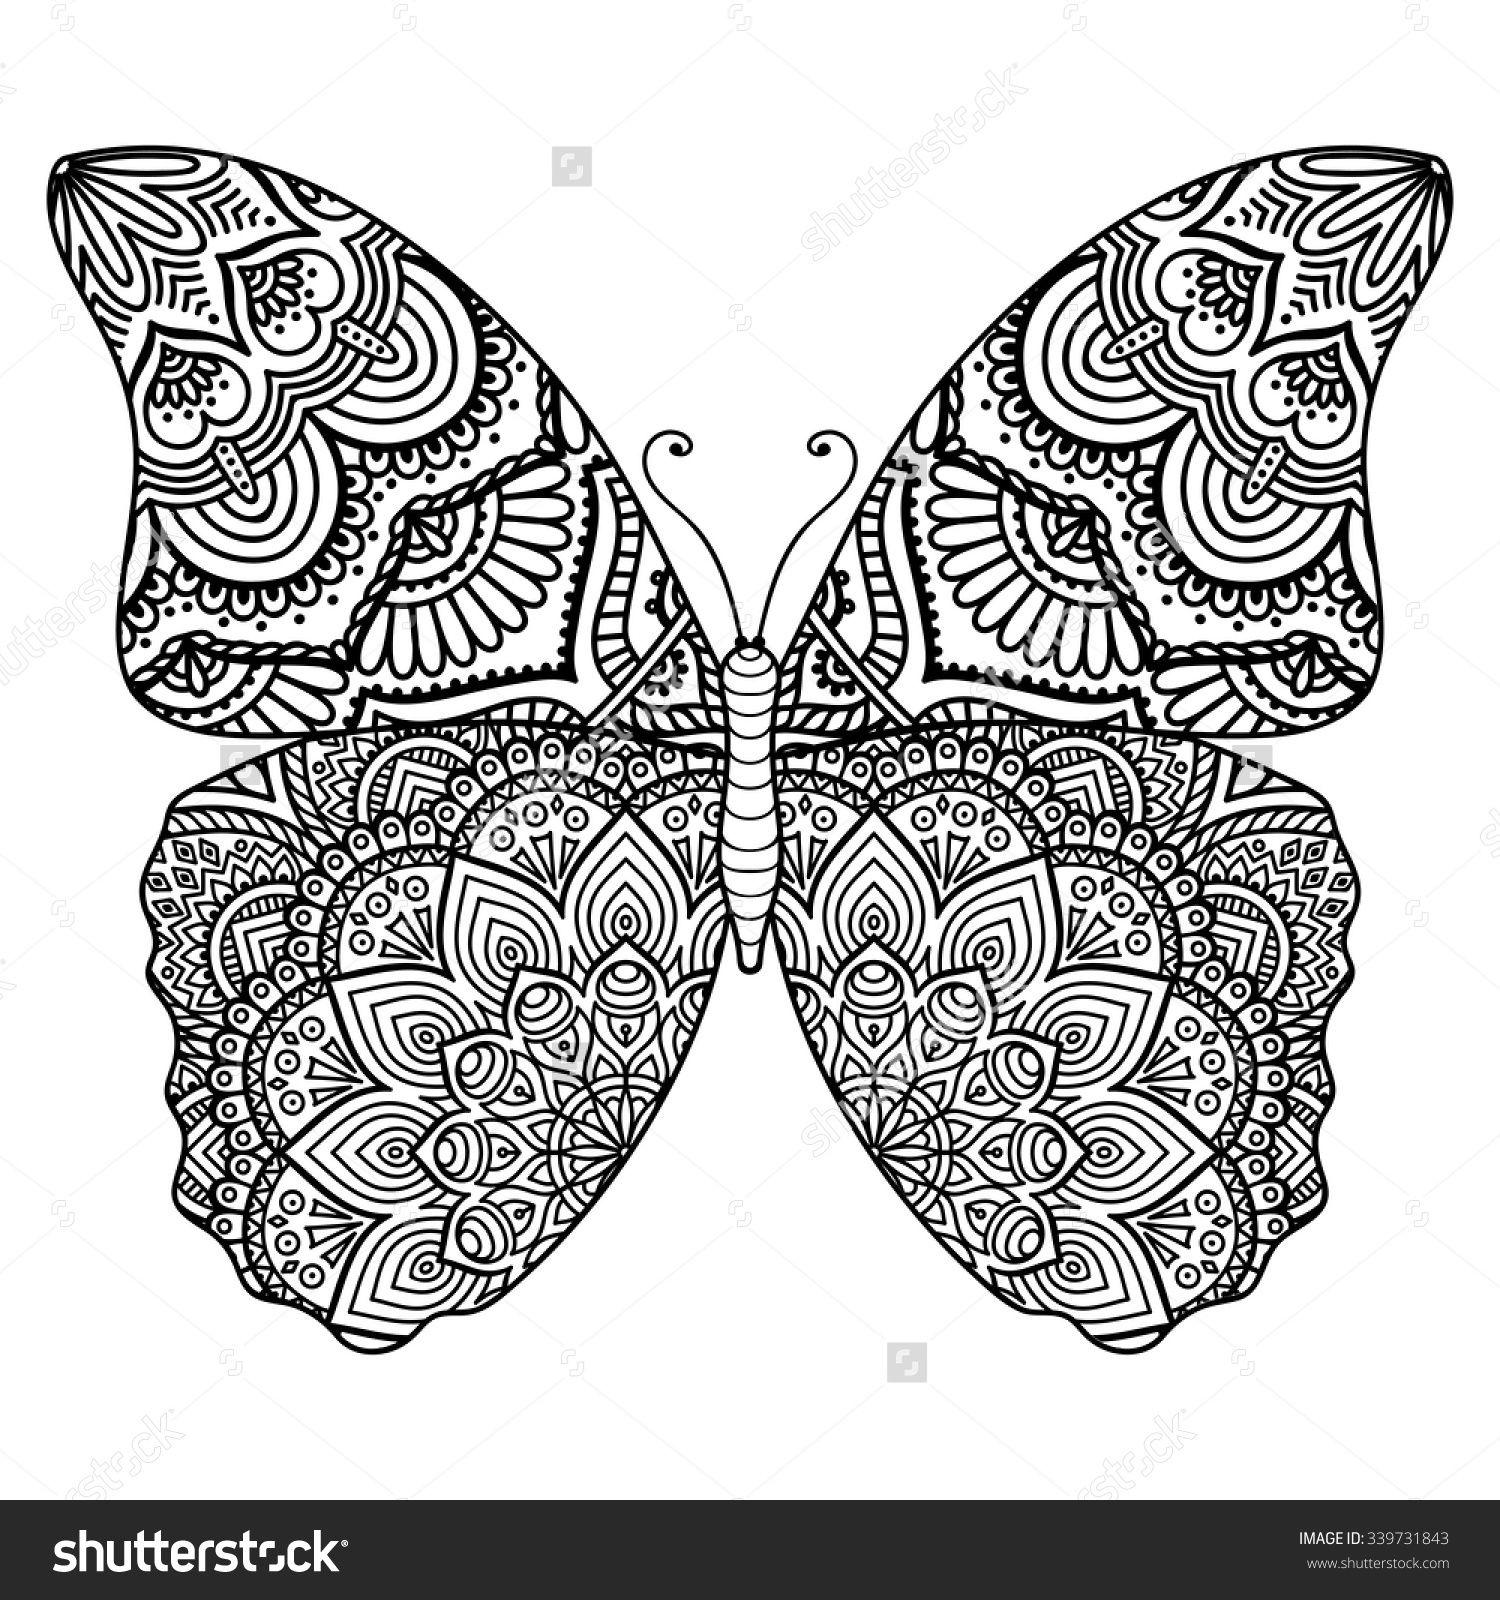 Resultado de imagen para mandala de mariposa para pintar ...